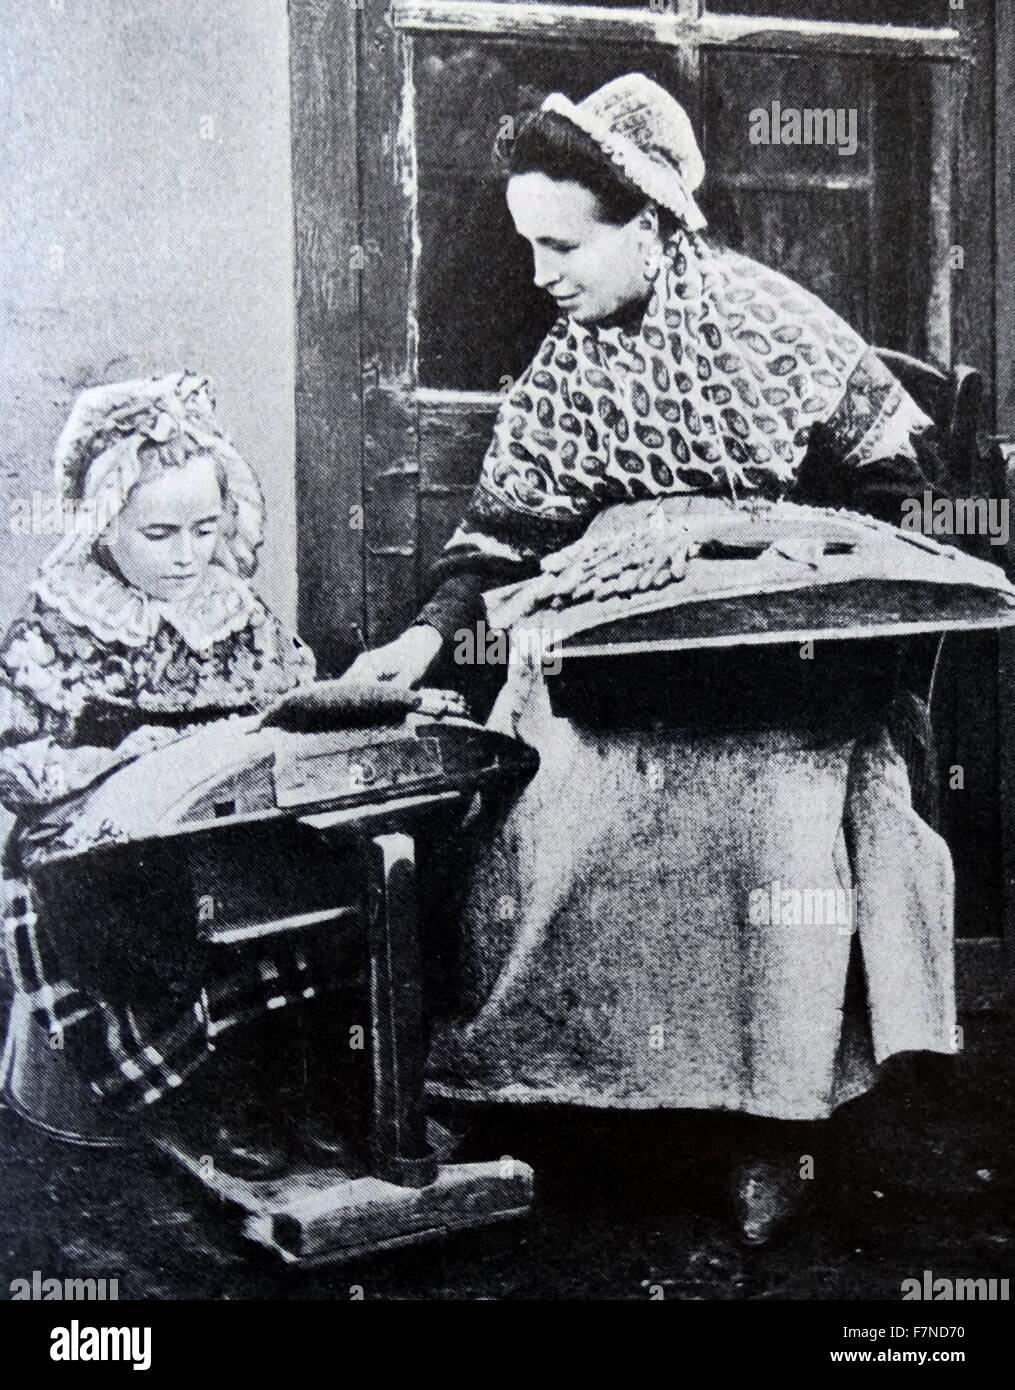 Belgian lacemaker 1900 - Stock Image